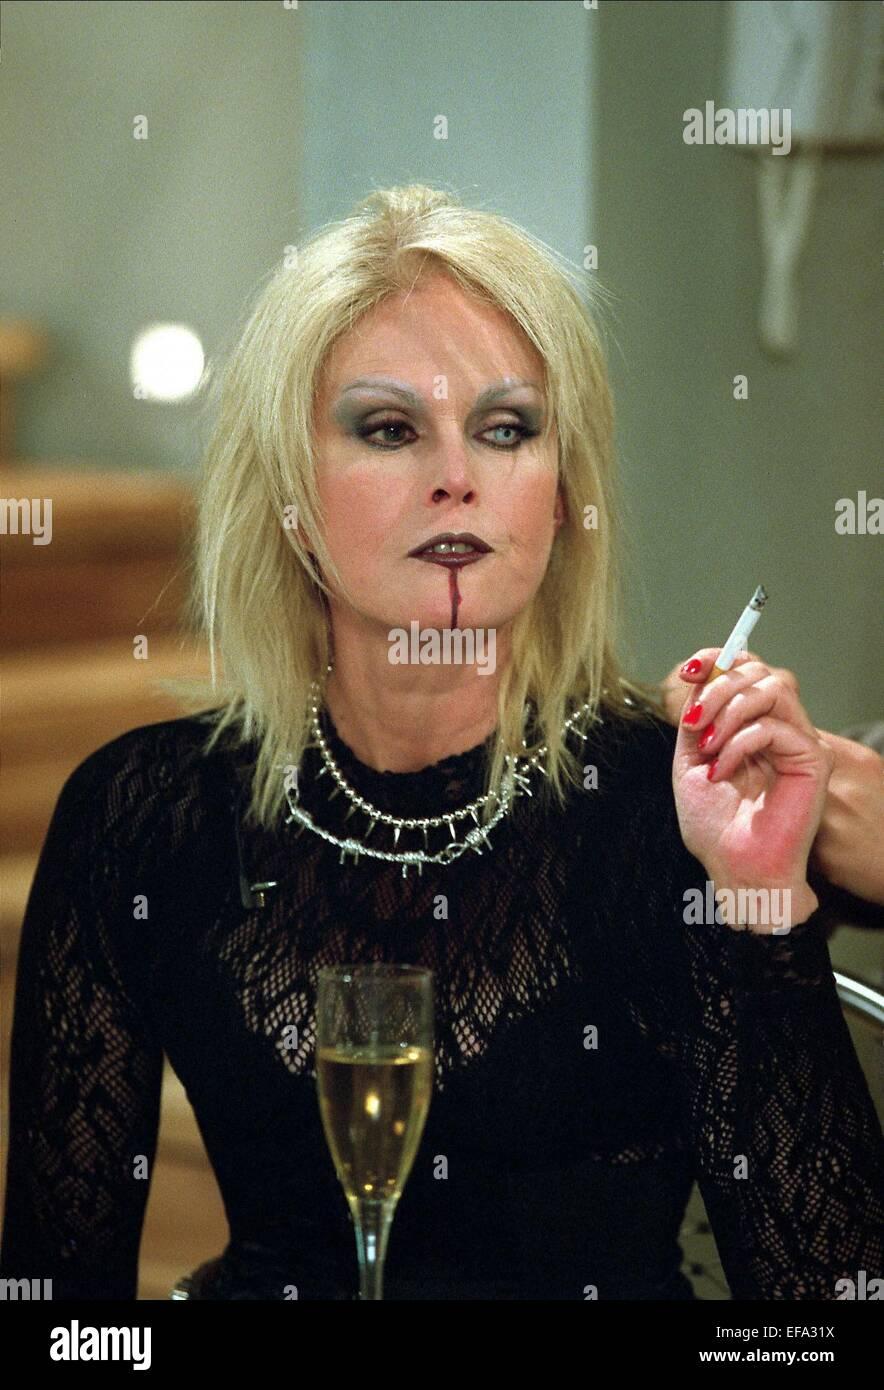 Lois Wilde,Cherie Currie Hot clips Morjana Alaoui,Katerina Katakalides